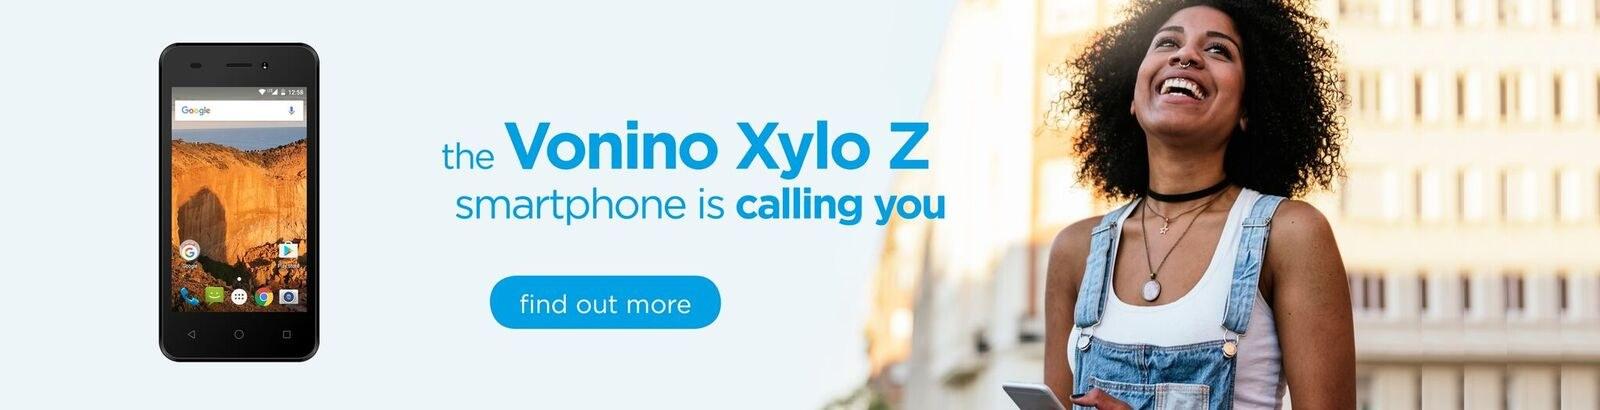 The Vonino Xylo Z